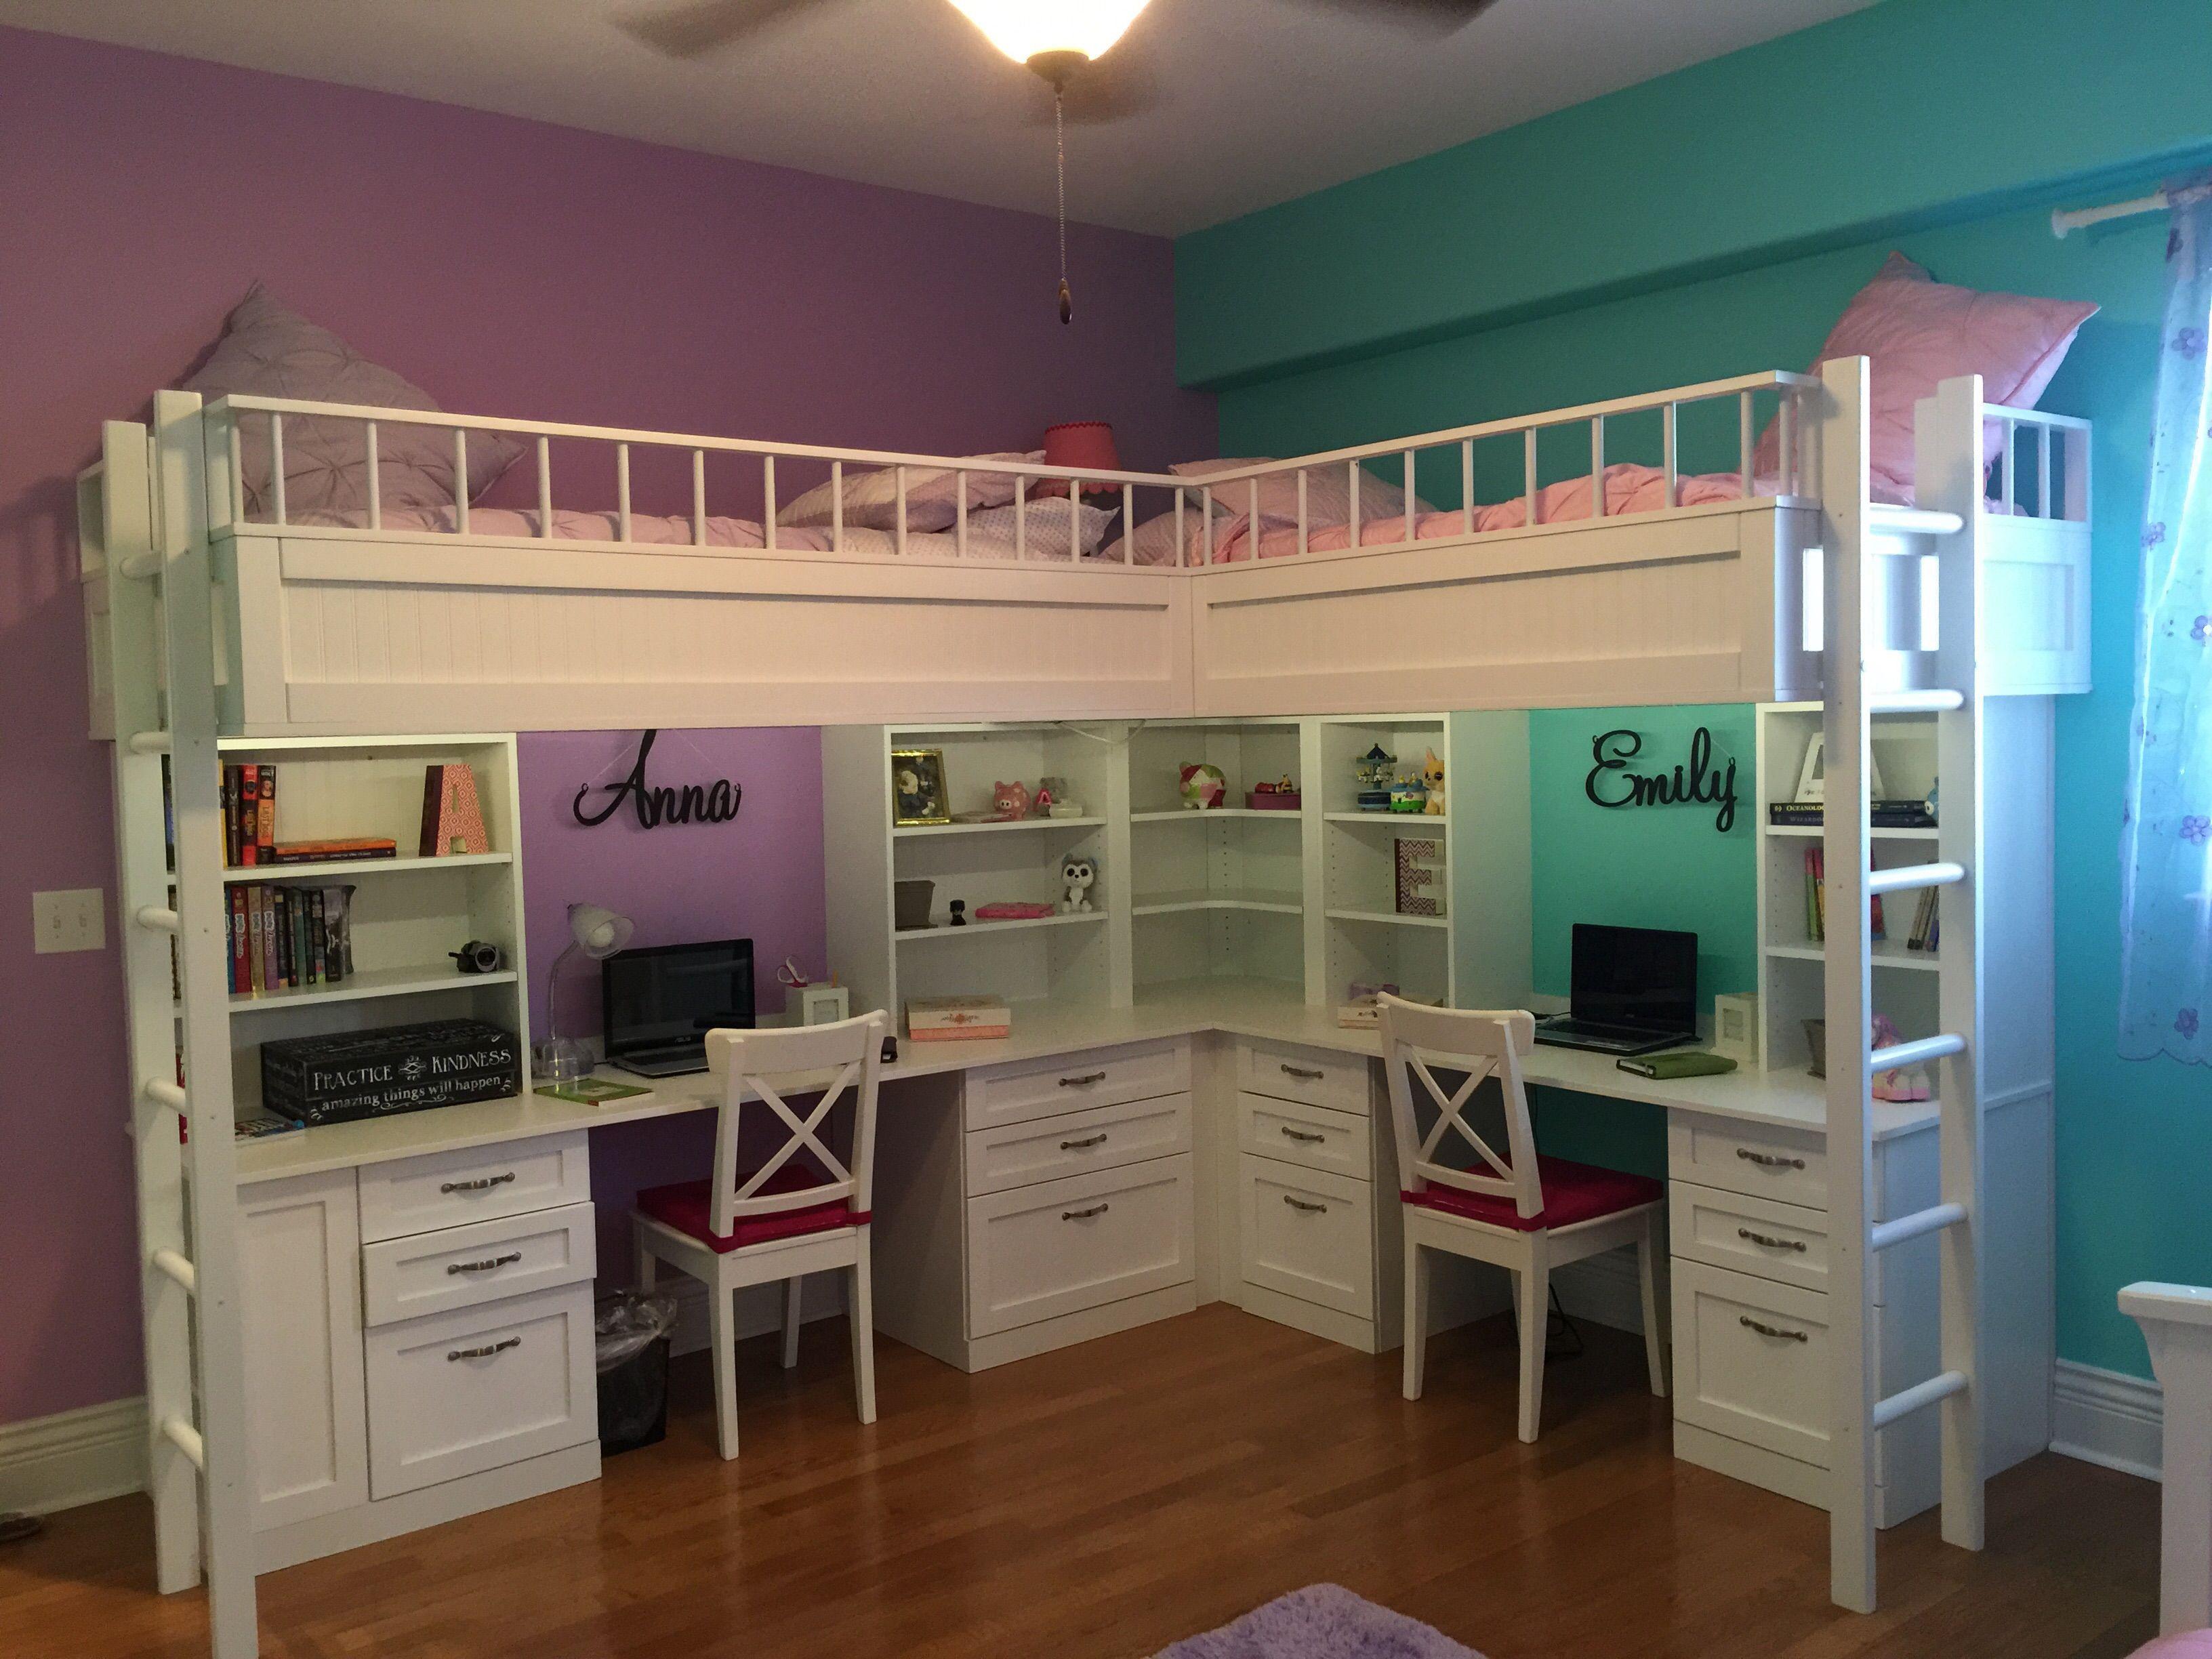 Custom Made Dual Loft Beds With Desks Kids Room Decor Pinterest Bunk Bed Bedrooms And Lofts